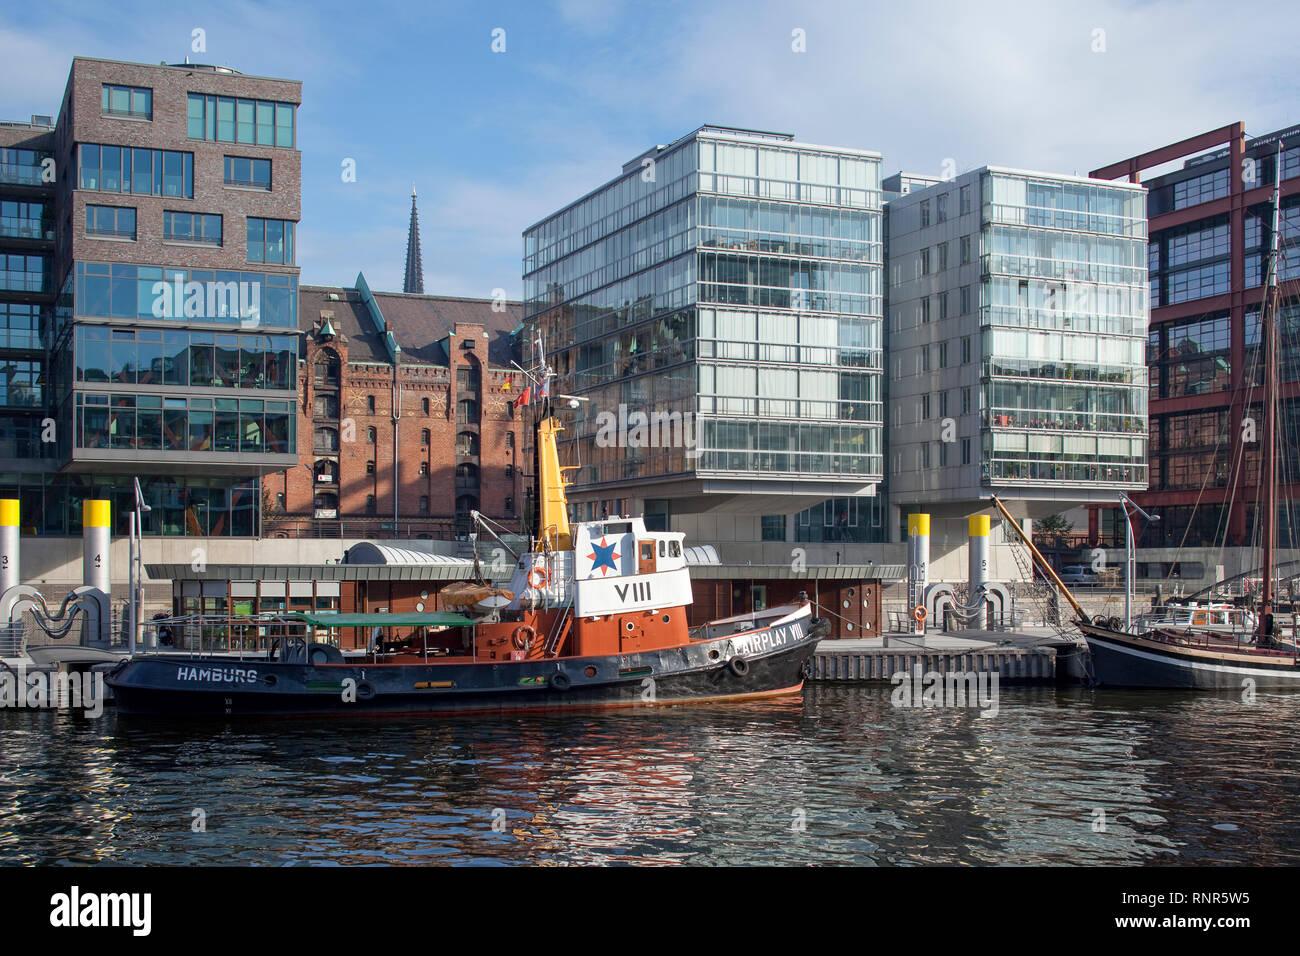 Historic tugboat 'Fairplay VIII' at the Sandtorhafen in Hamburg, Germany. - Stock Image